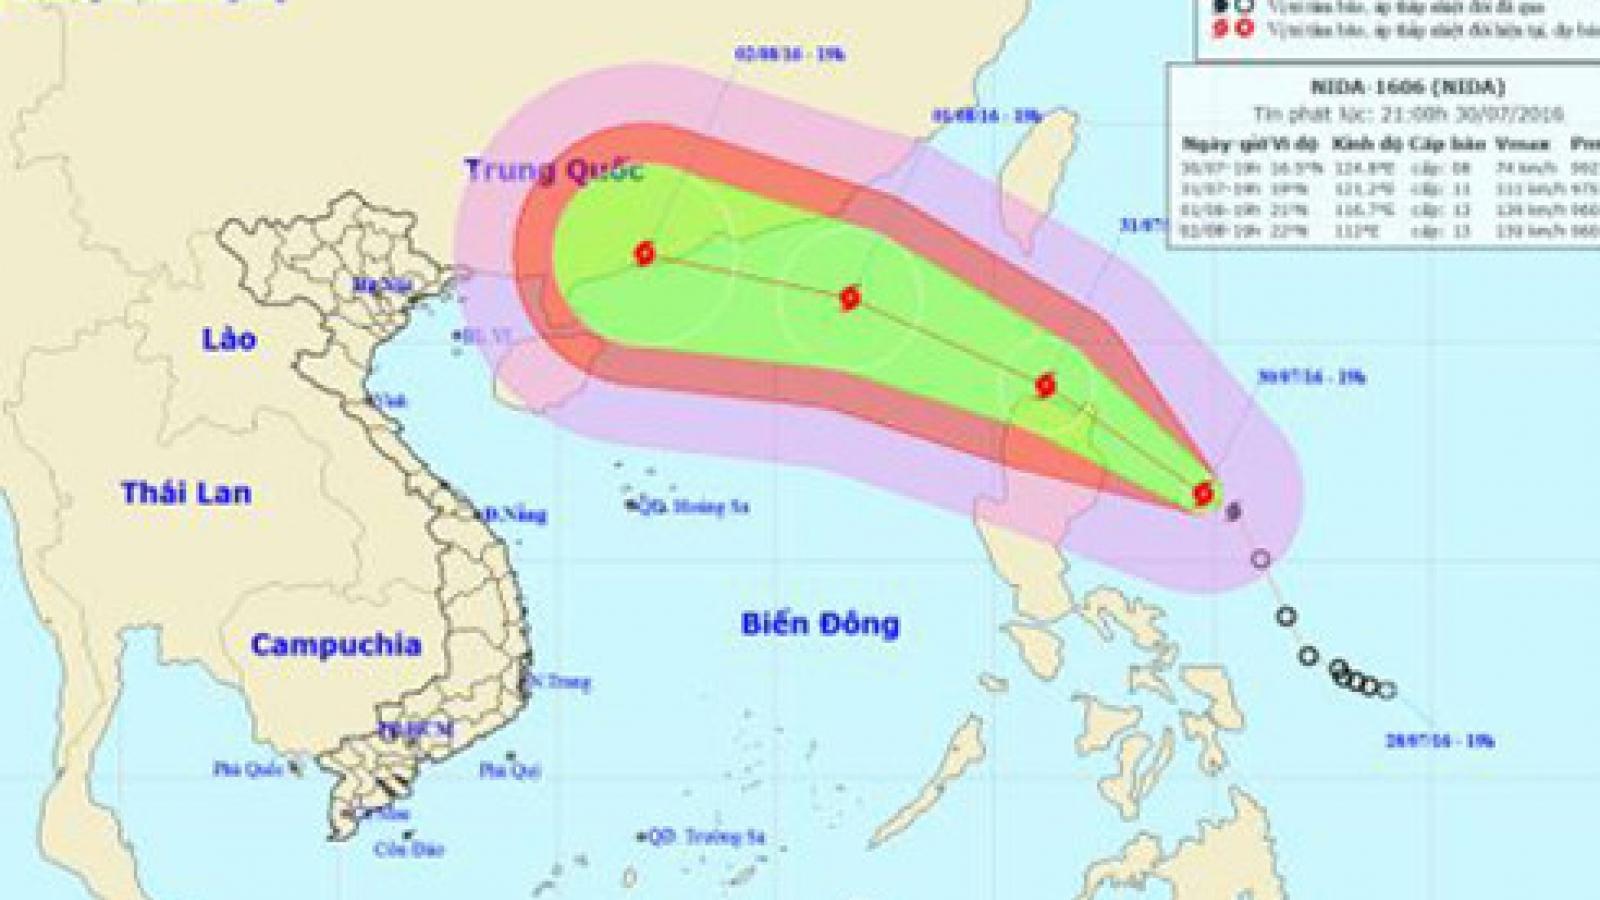 Typhoon Nida strengthens, coastal localities put on alert